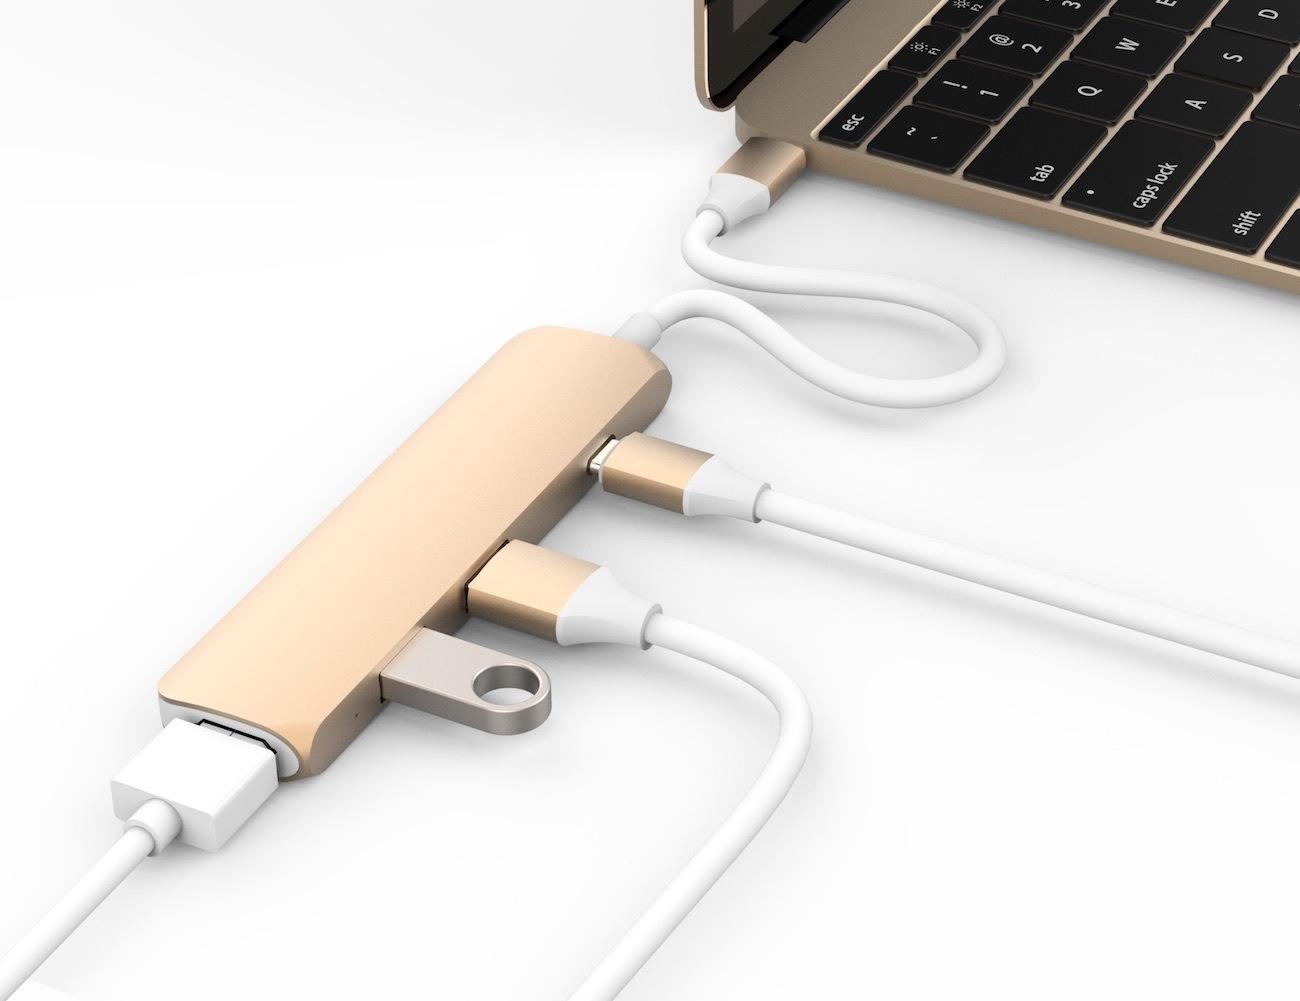 HyperDrive USB Type-C Hub